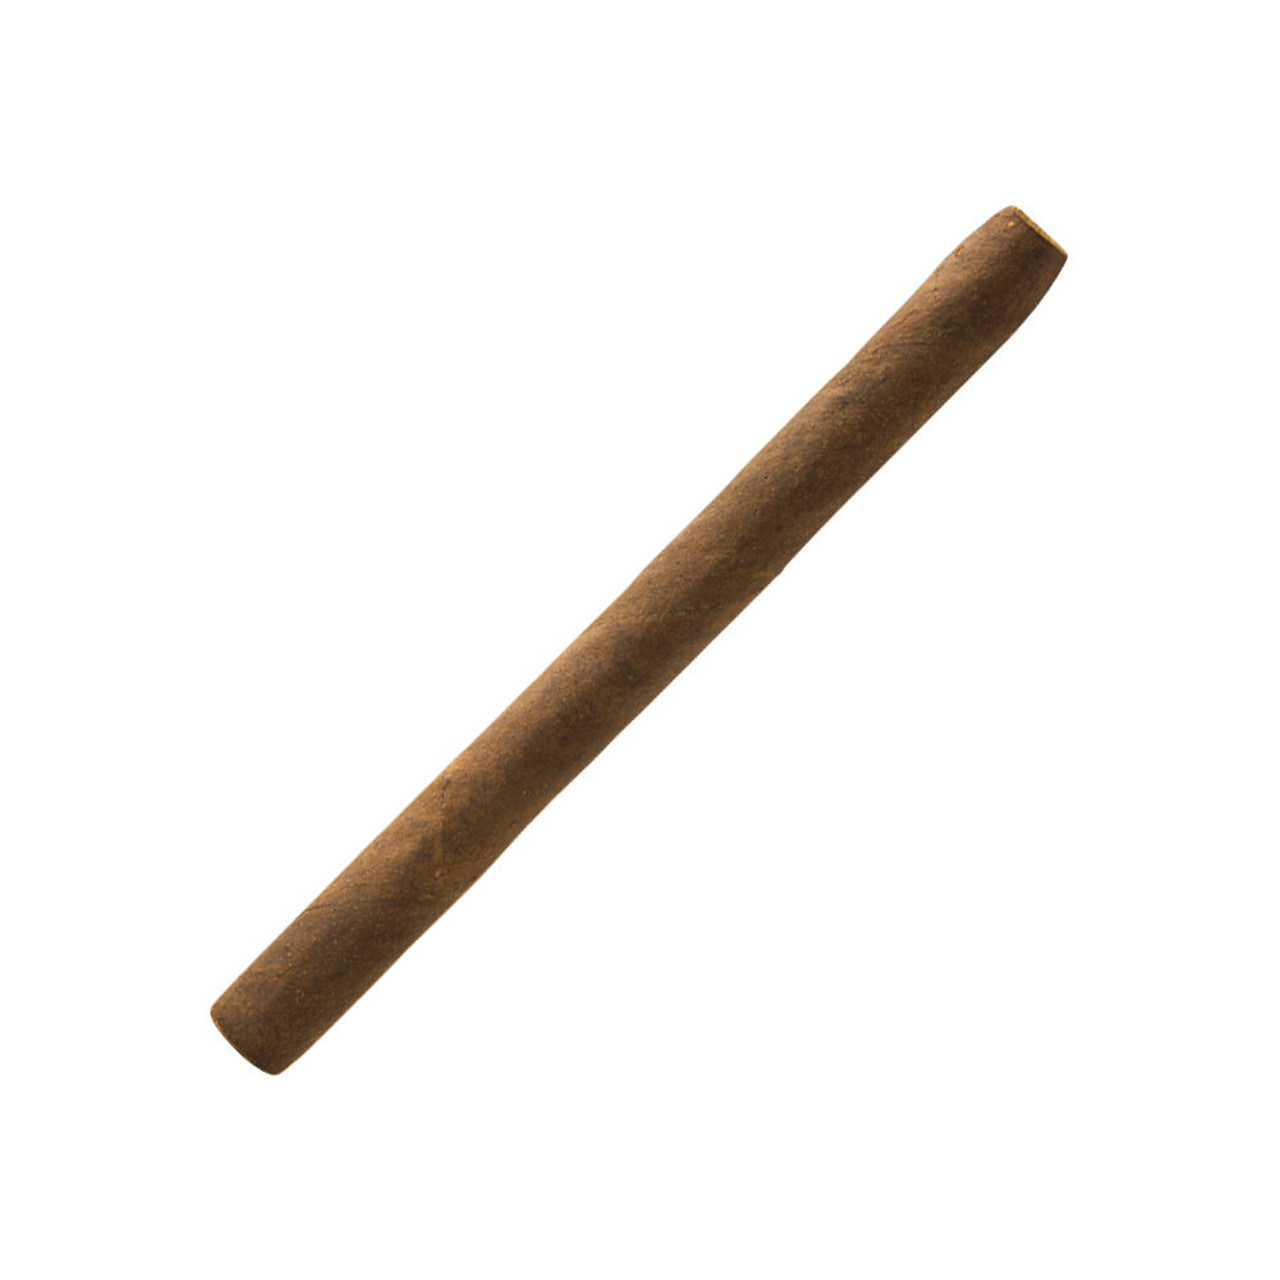 Agio Mehari's Cigarillos Brazil Cigars - 4 x 23 (20 packs of 10 (200 total))